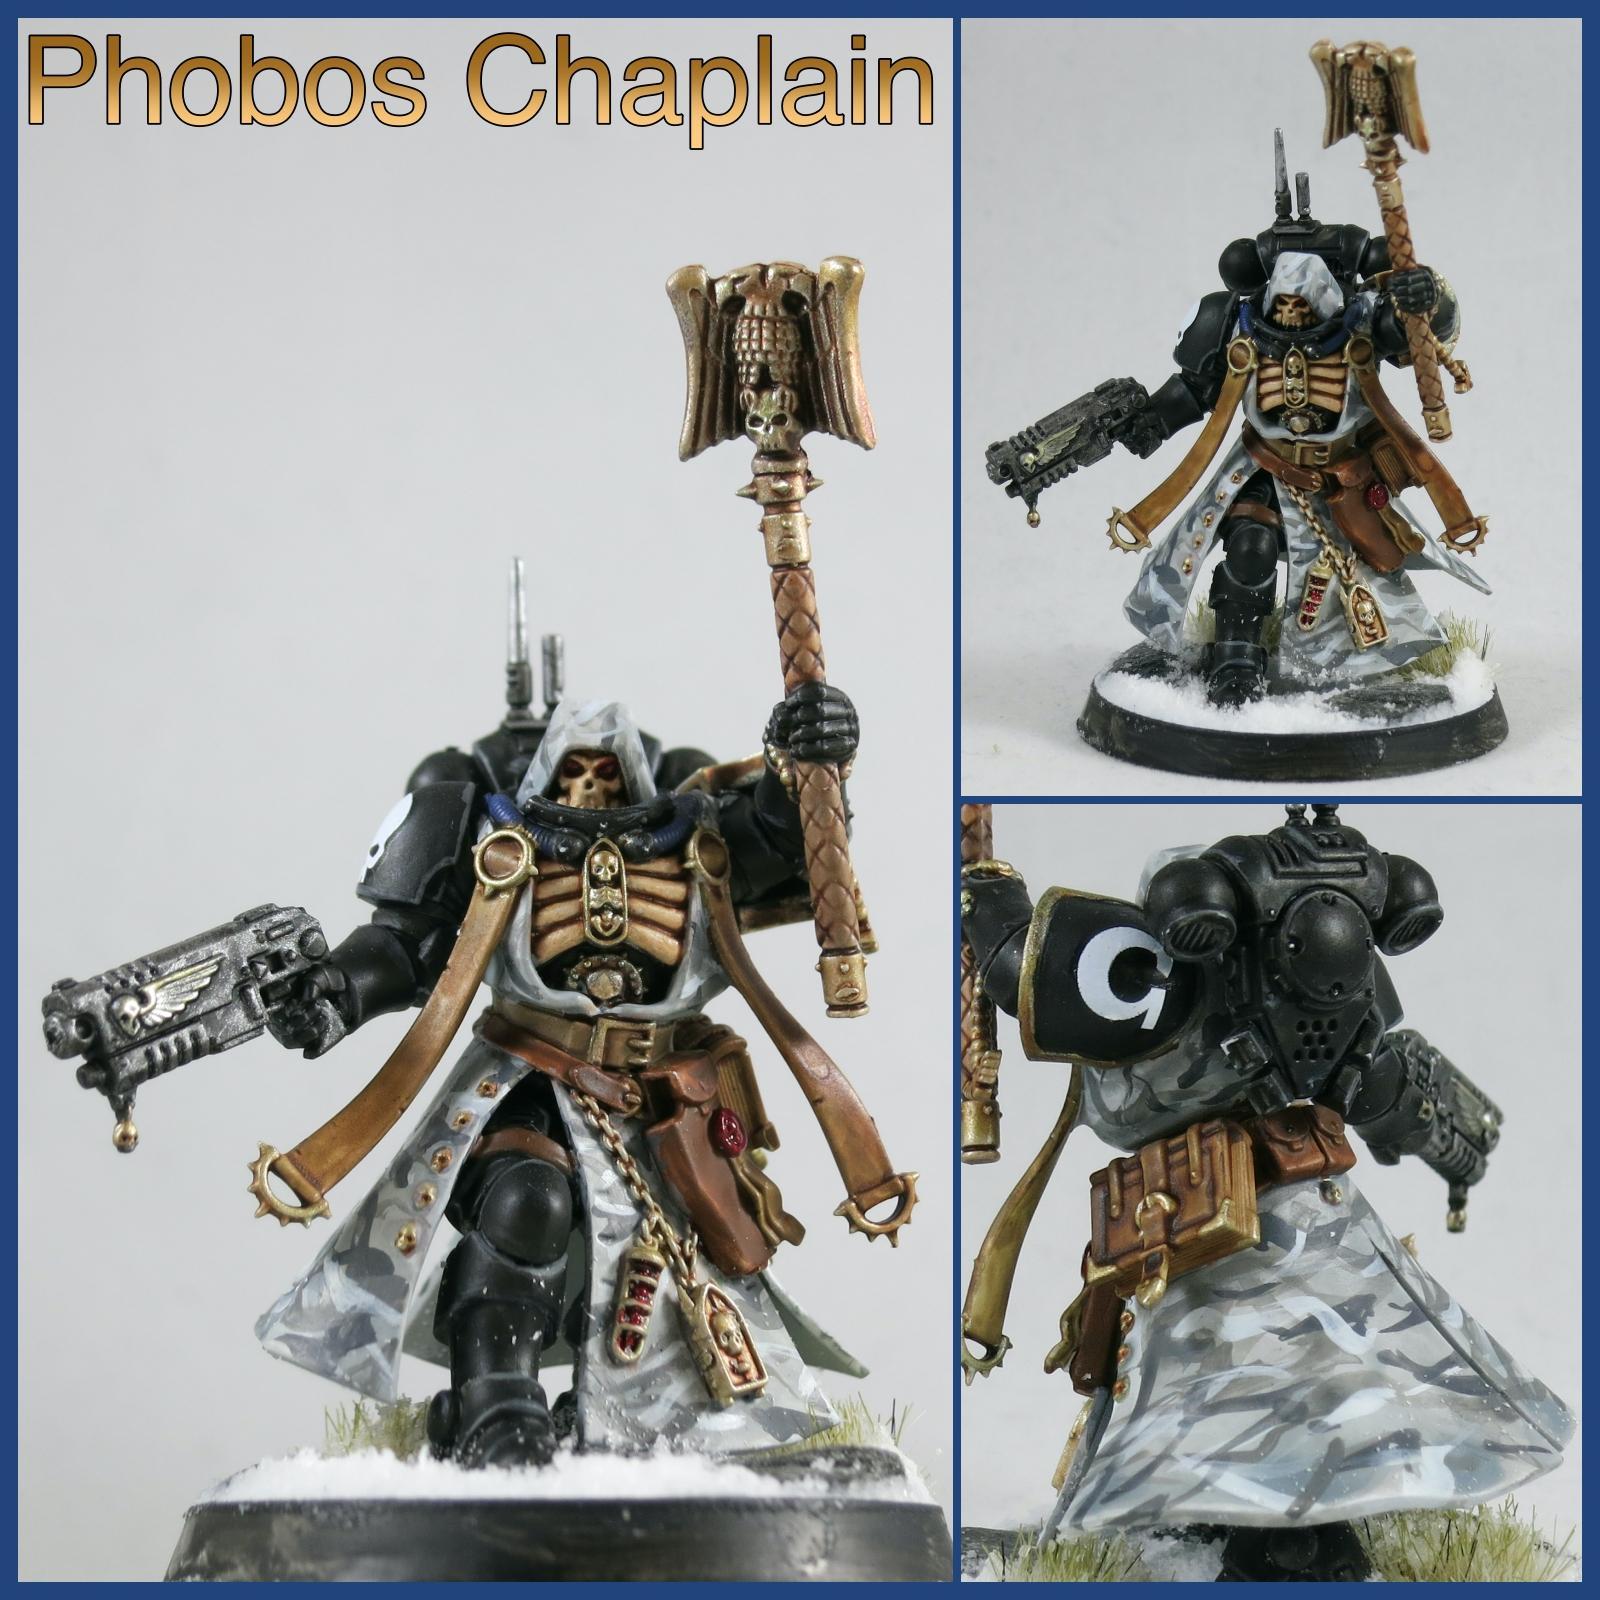 Chaplain, Phobos, Phobos Chaplain